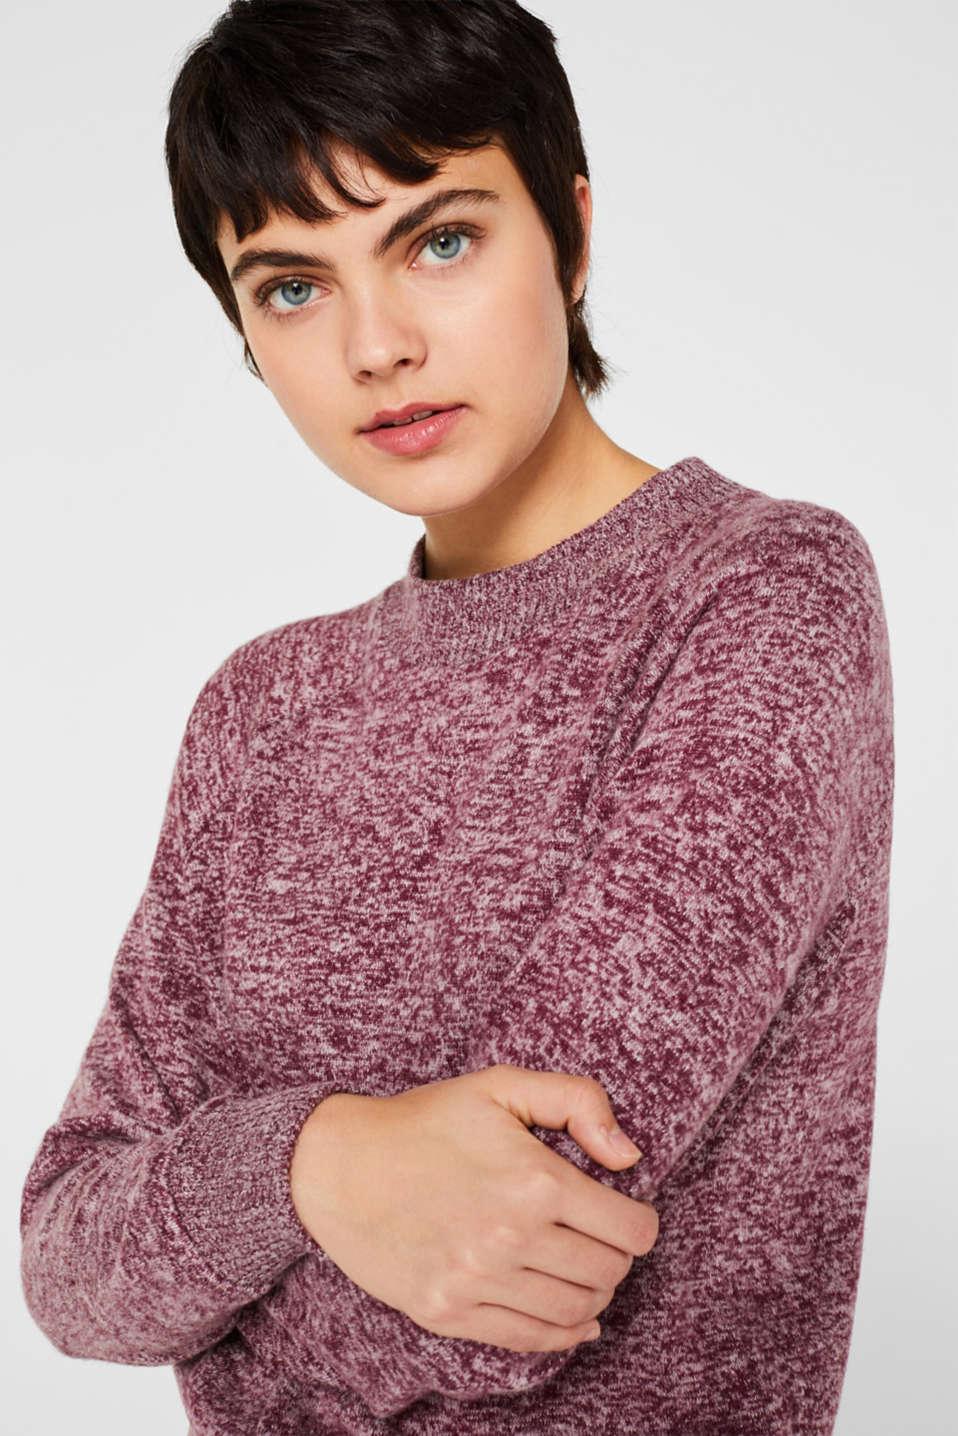 Fluffy sweatshirt in a melange finish, BORDEAUX RED 5, detail image number 5